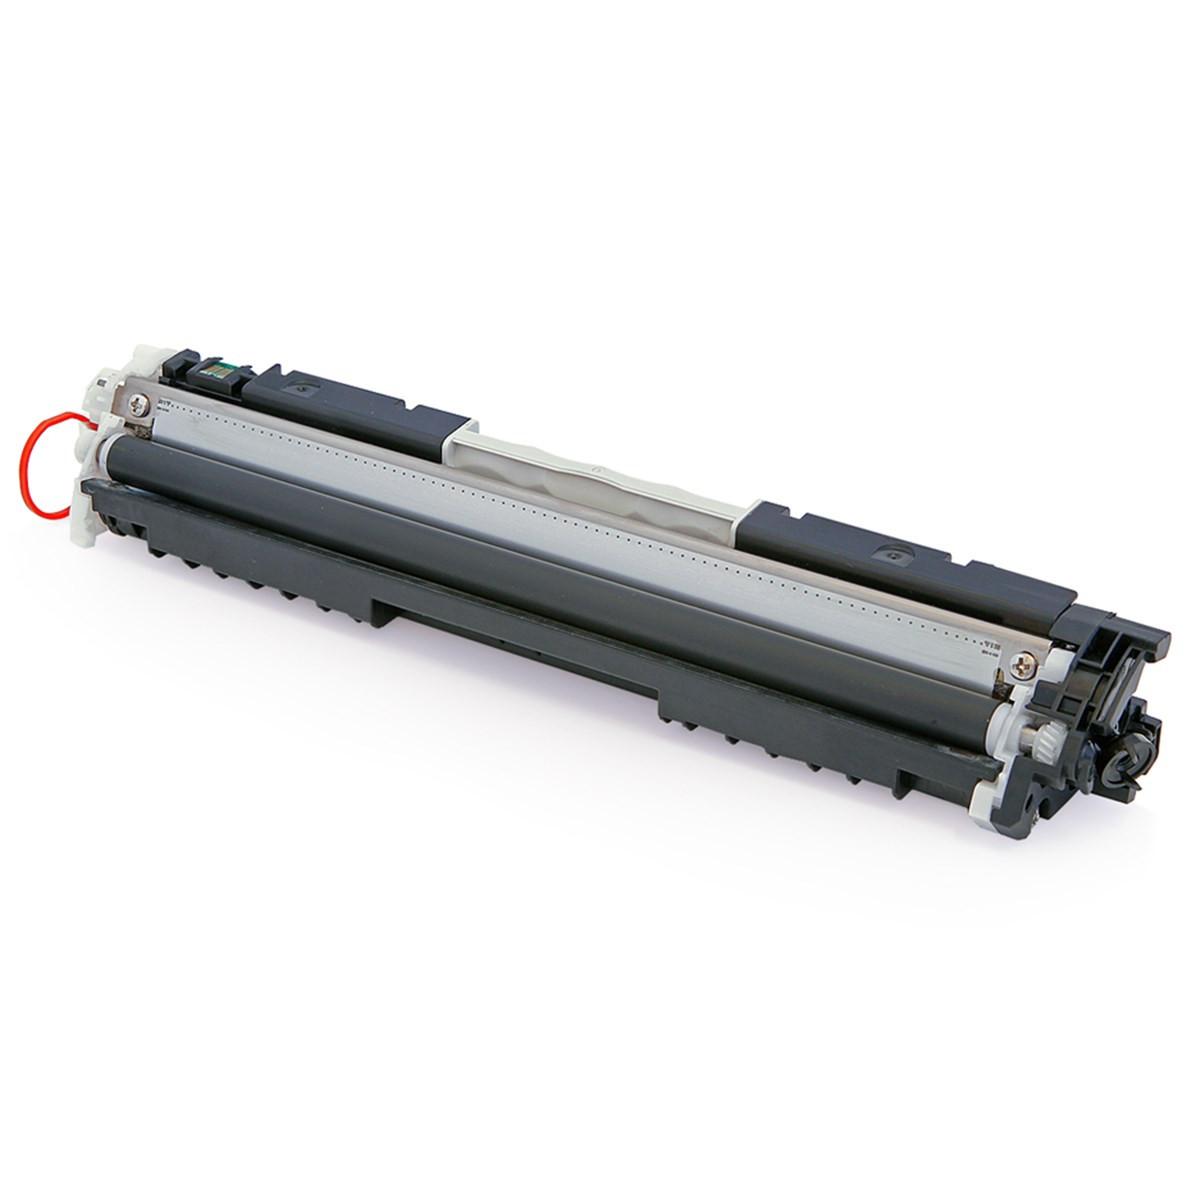 Toner Compatível com HP CF352A Universal Amarelo 130A | M176N M177FW M176 M177 | Premium 1k